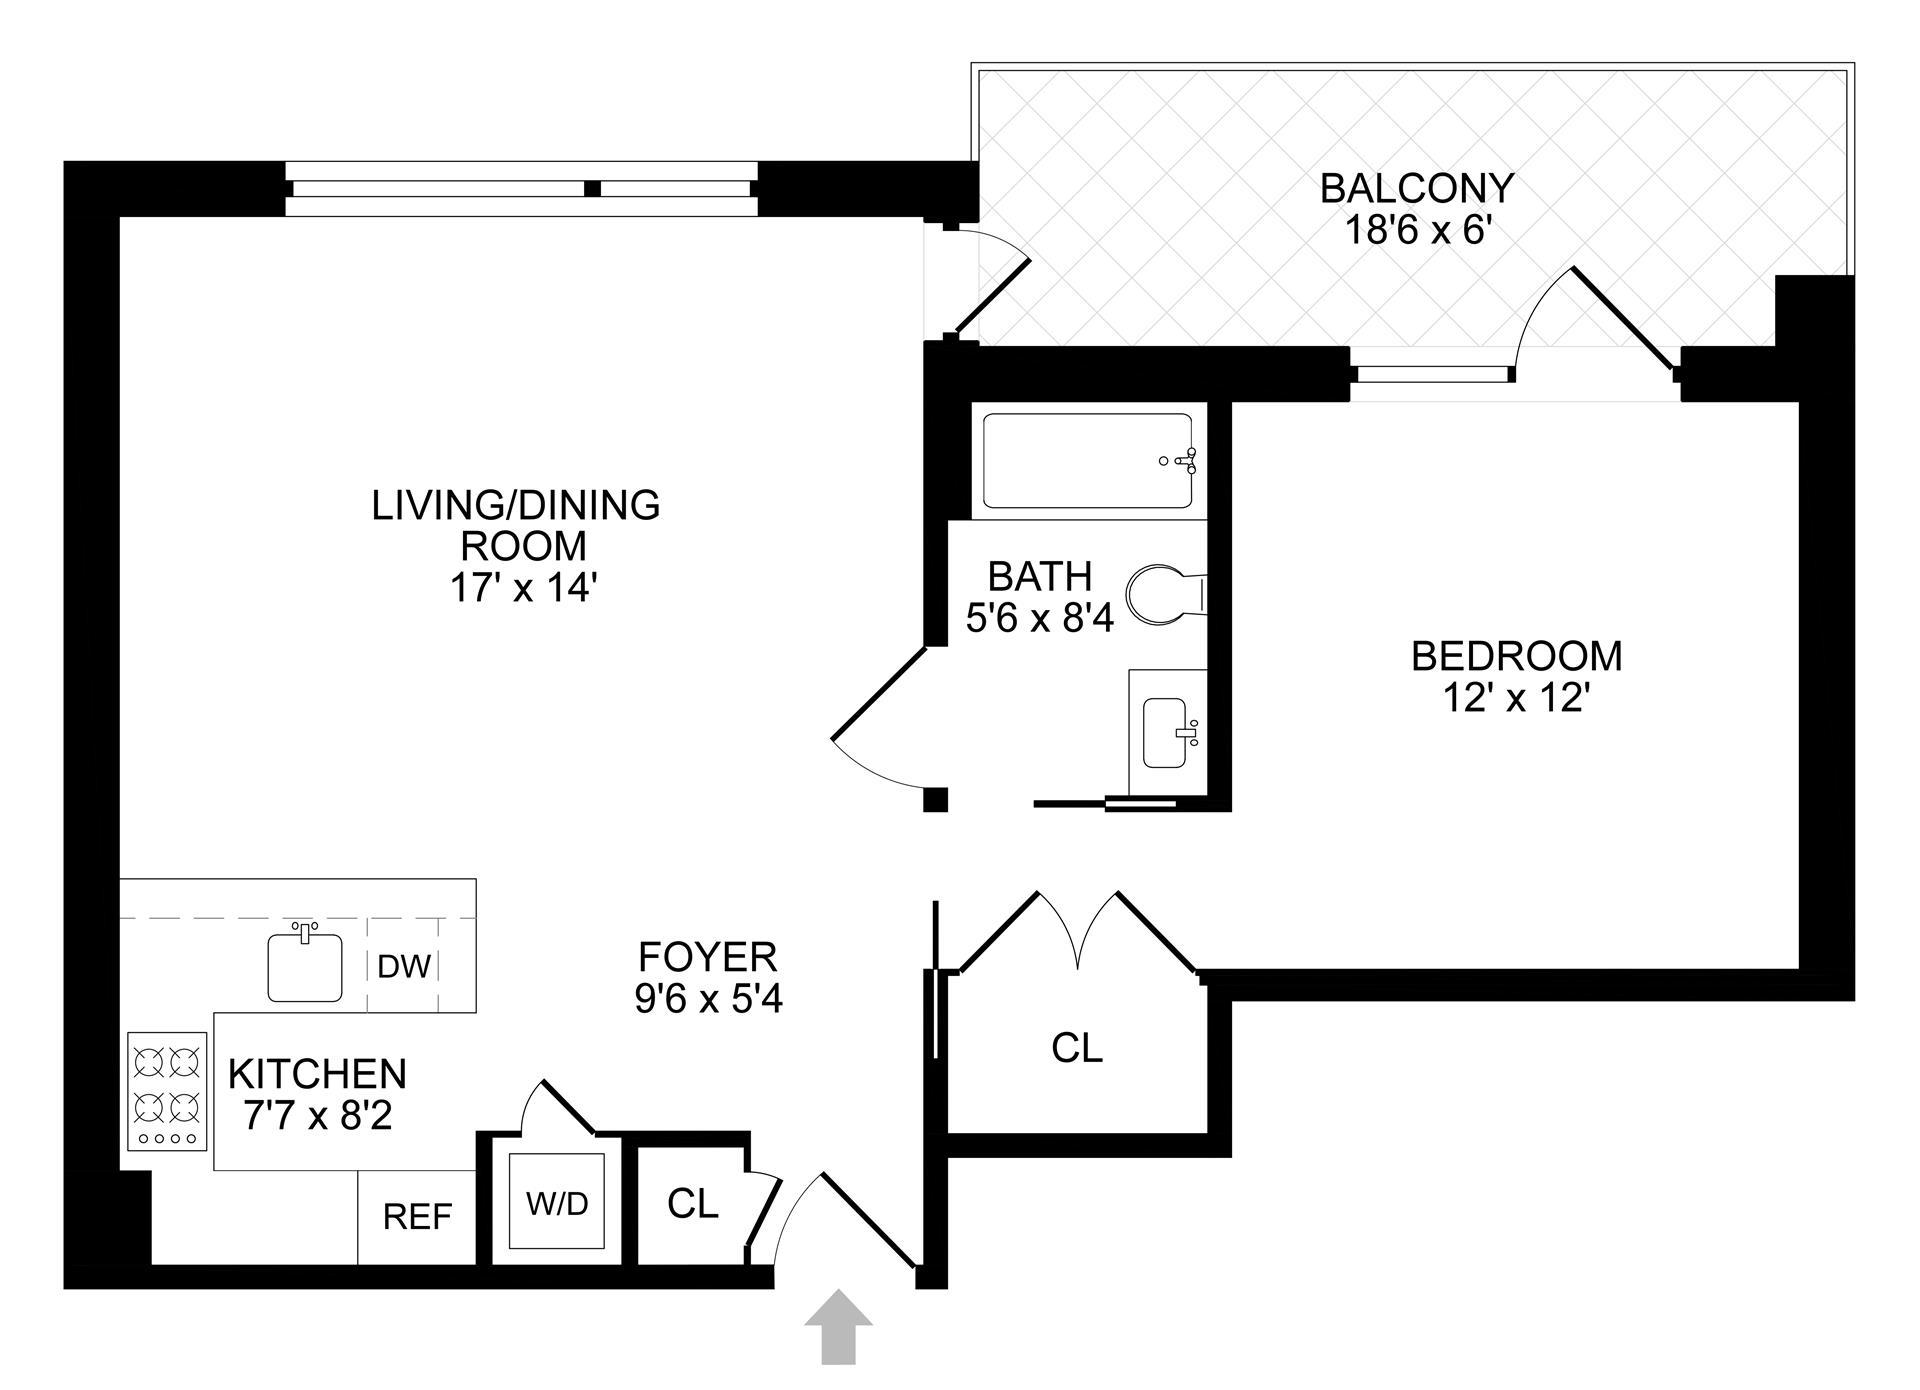 Floor plan of 299 Van Buren Street, 3B - Bedford - Stuyvesant, New York